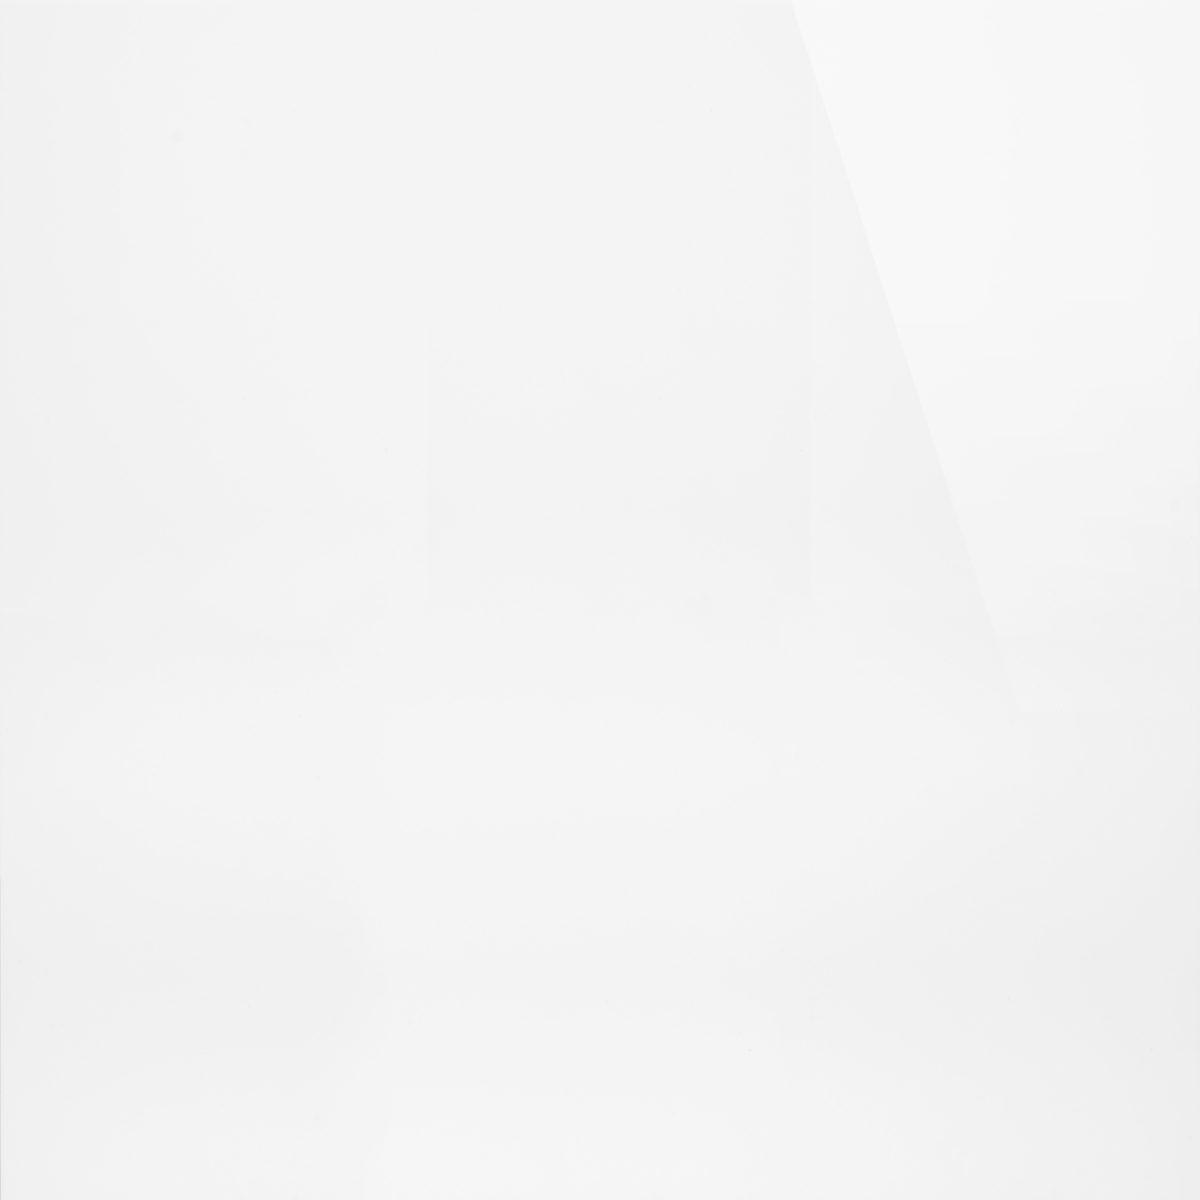 Lapitech Worktop Absolute White - Lux Finish